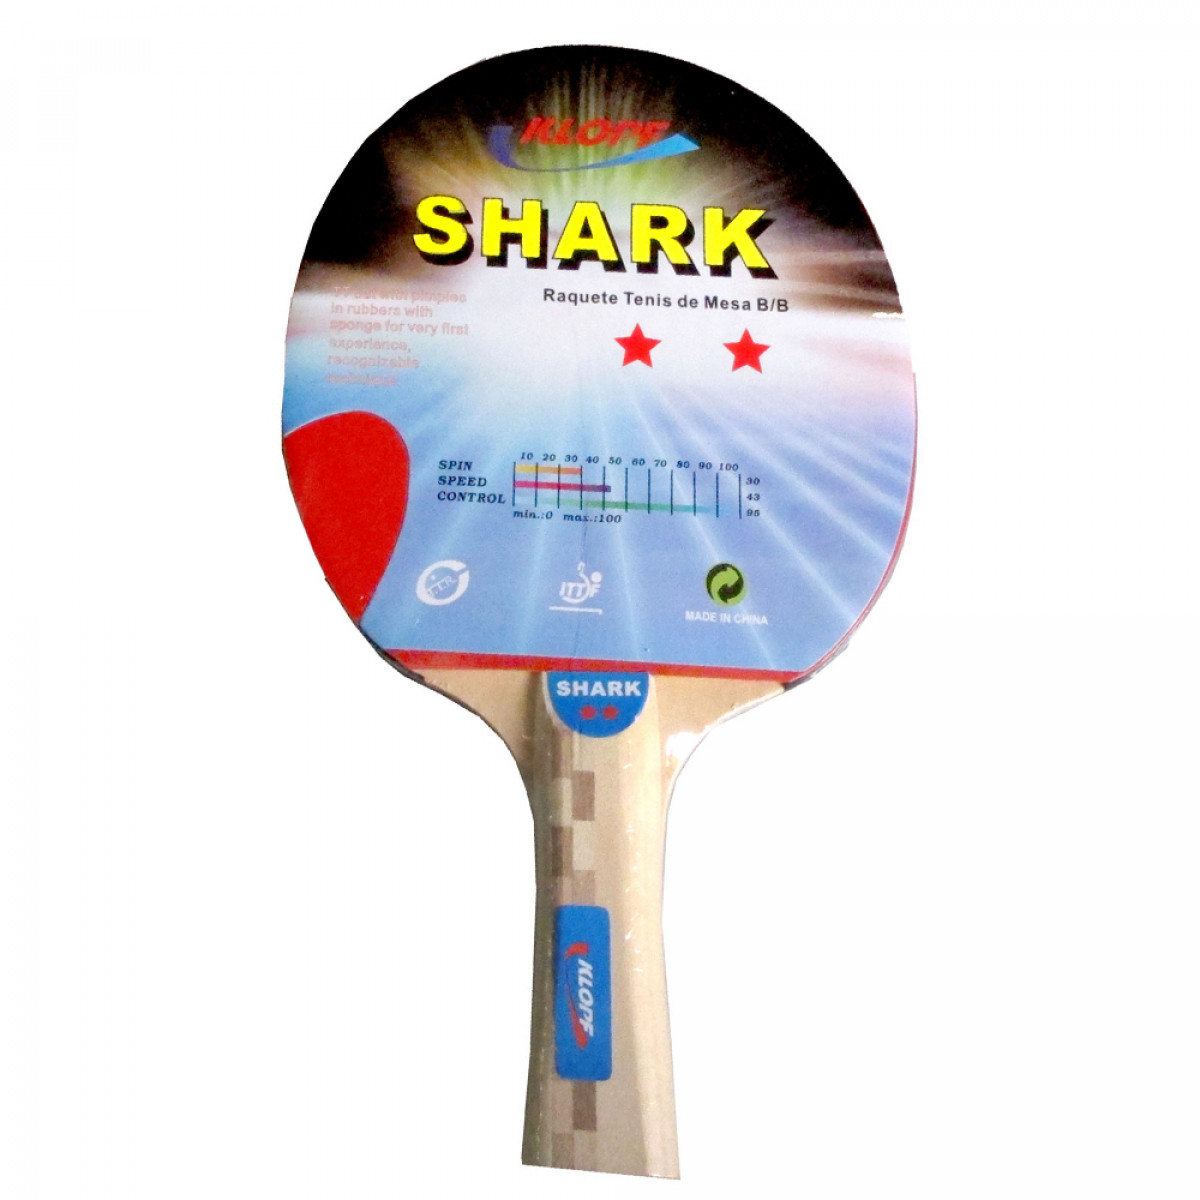 Raquete de Tênis de Mesa   Ping Pong - Lisa Luxo - Klopf - Cód. 5015 ... 91d25ac0f88cf